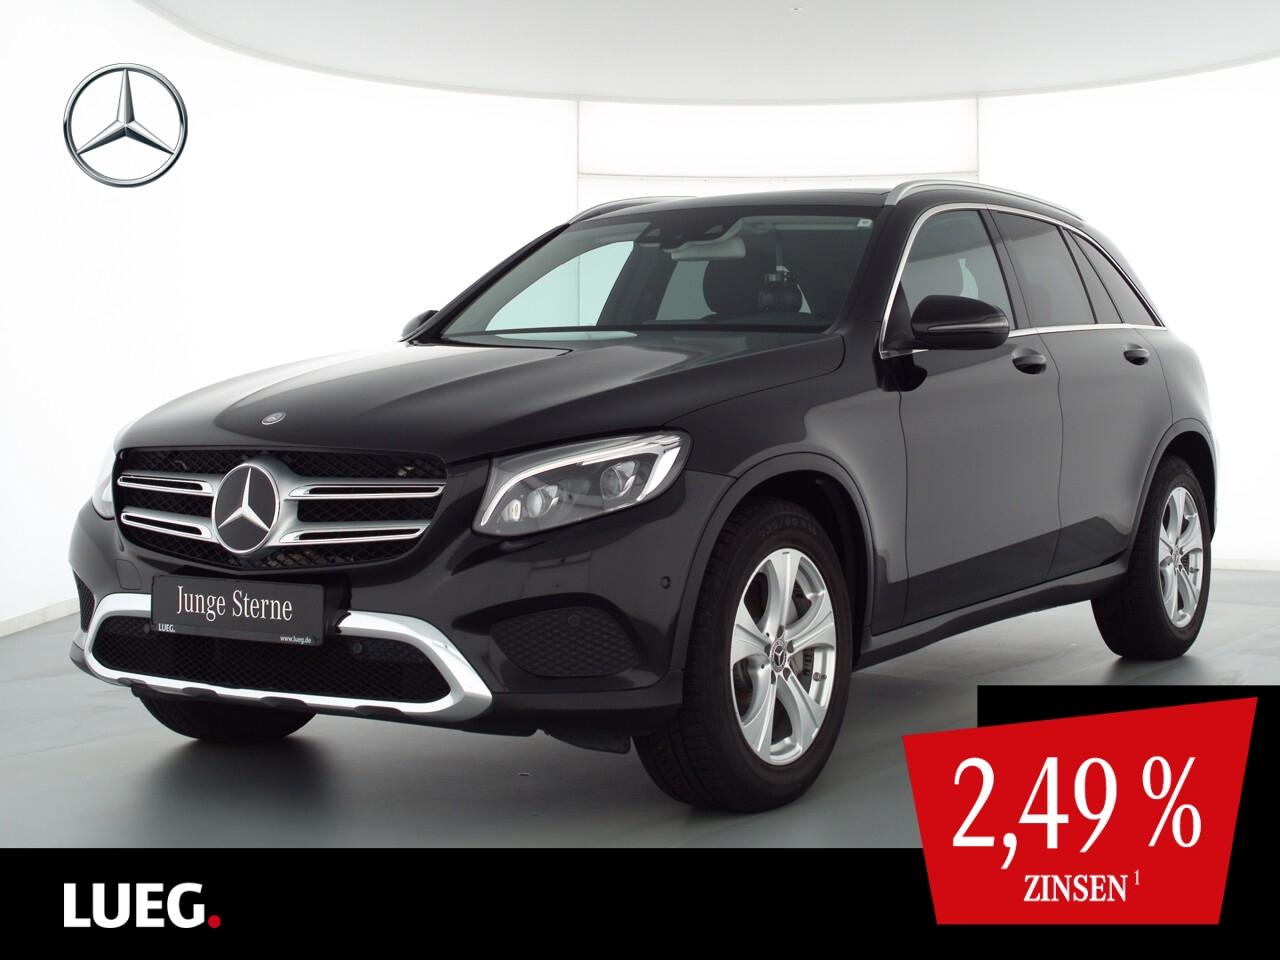 Mercedes-Benz GLC 220 d 4M Navi+Pano+LED-ILS+Sthzg+Distr+ParkA, Jahr 2017, Diesel